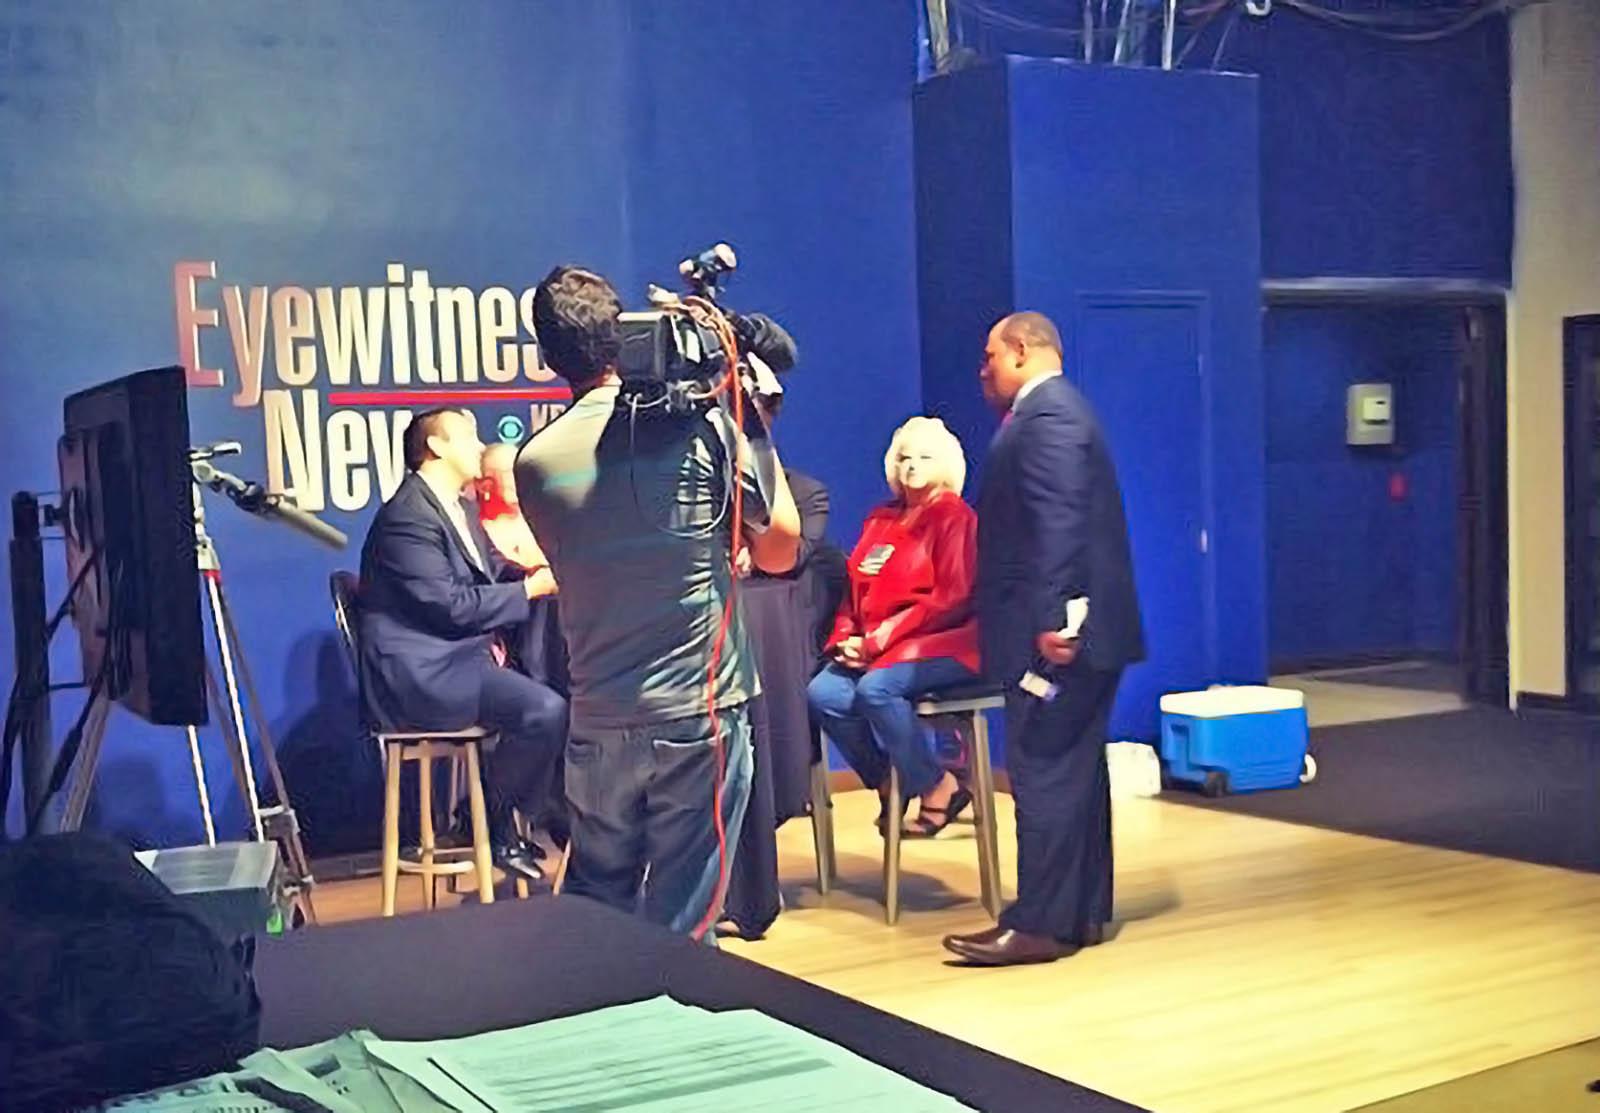 KBAK TV news at News Room